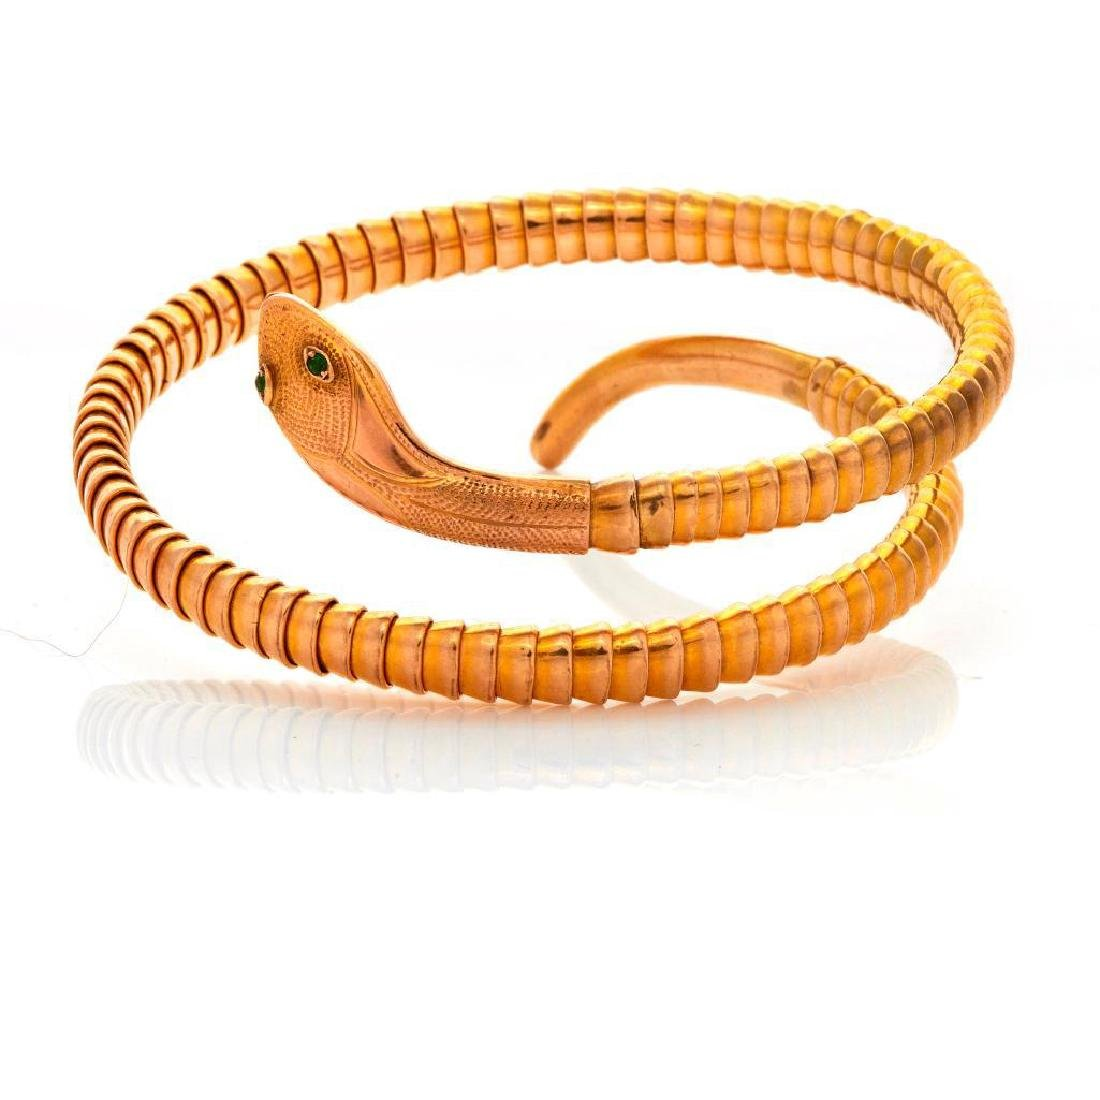 9k gold snake bracelet with sapphire eyes - 2